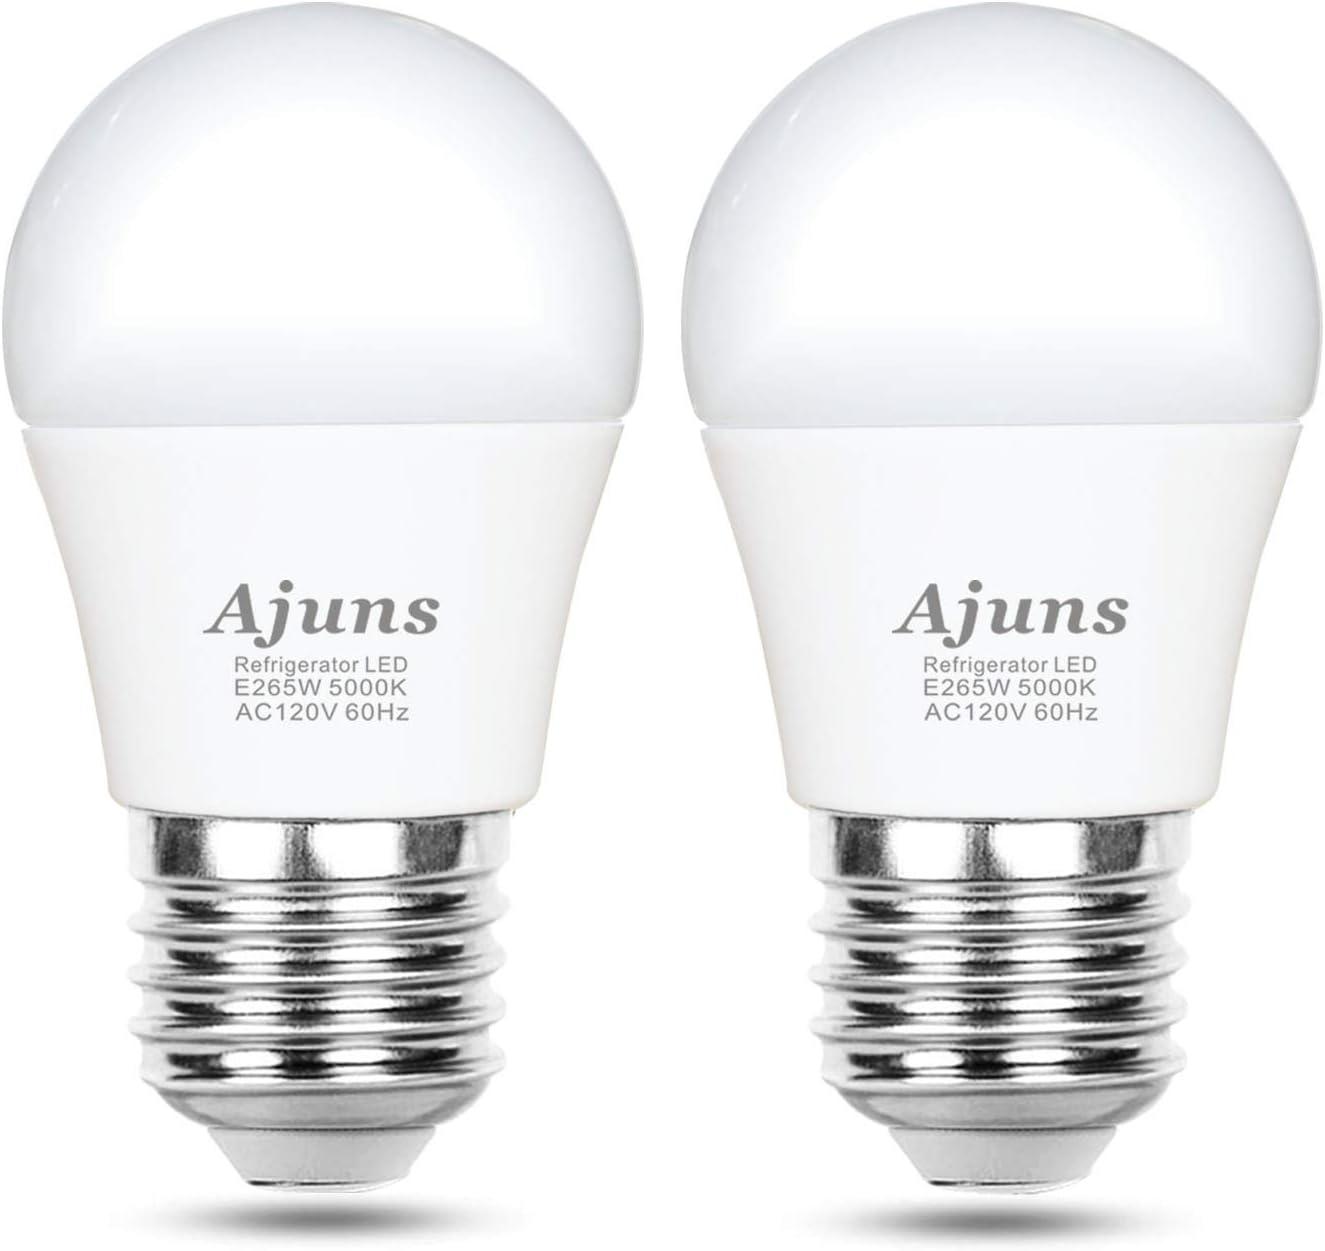 LED Refrigerator Light Bulb, 40W Equivalent 120V A15 Fridge Freezer  Waterproof Light Bulb, Used for Home Lighting Such as Freezer, Kitchen,  Bathroom, ...